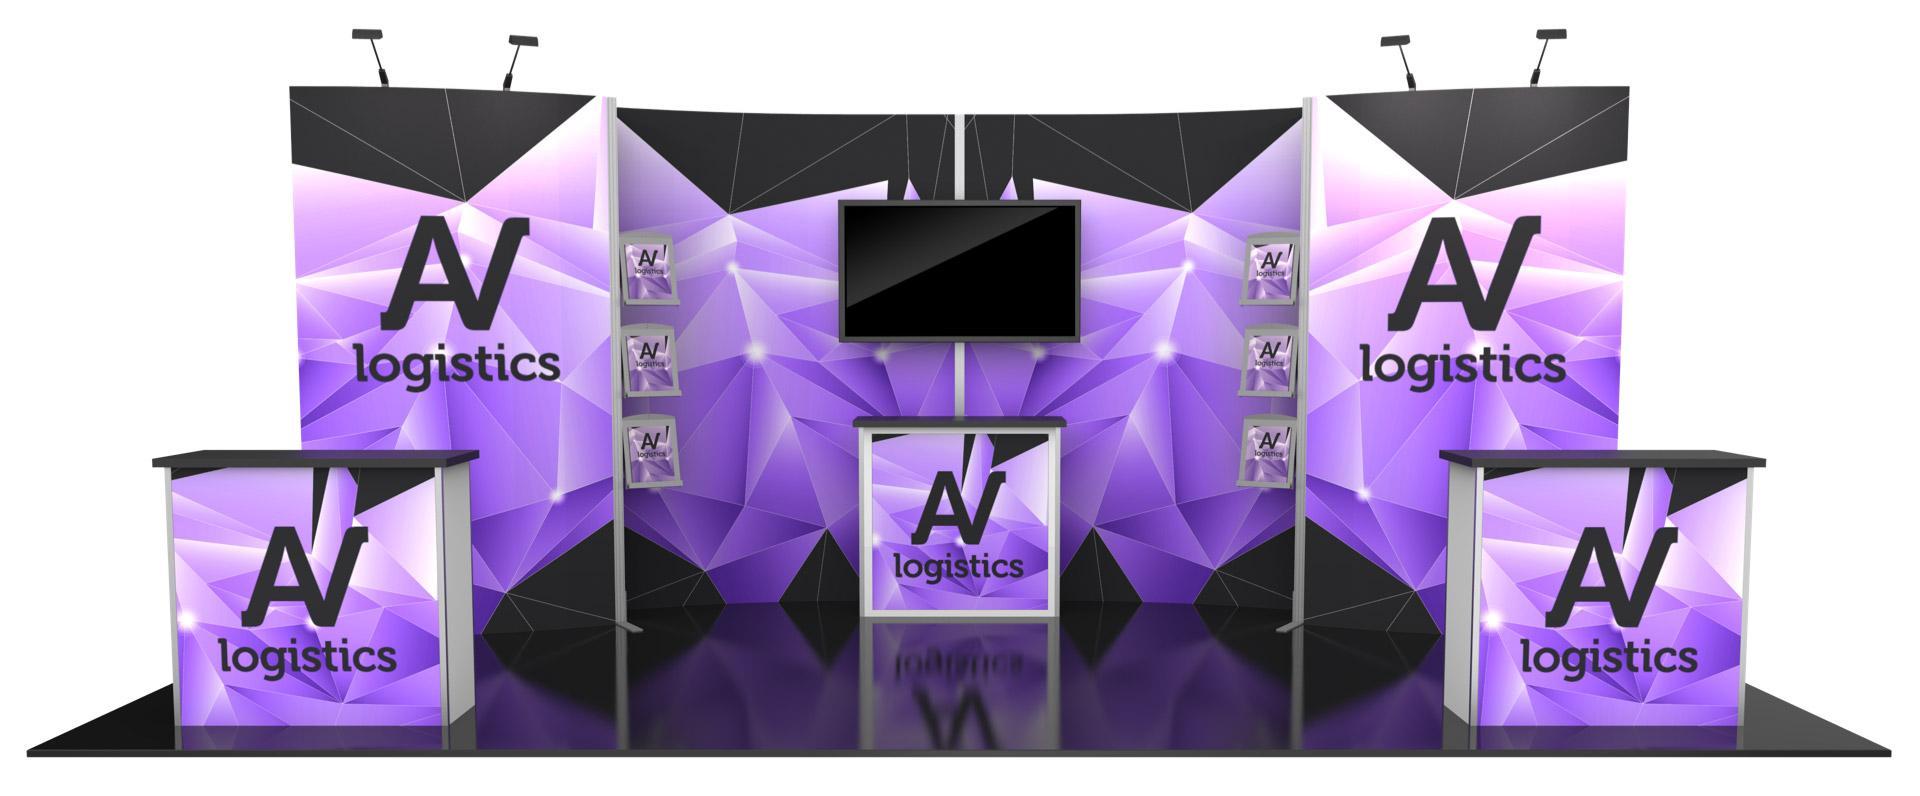 Hybrid Pro Modular Kit 10, hybrid trade show displays, Modular displays, hybrid display, hybrid exhibits, hybrid displays, custom modular exhibits